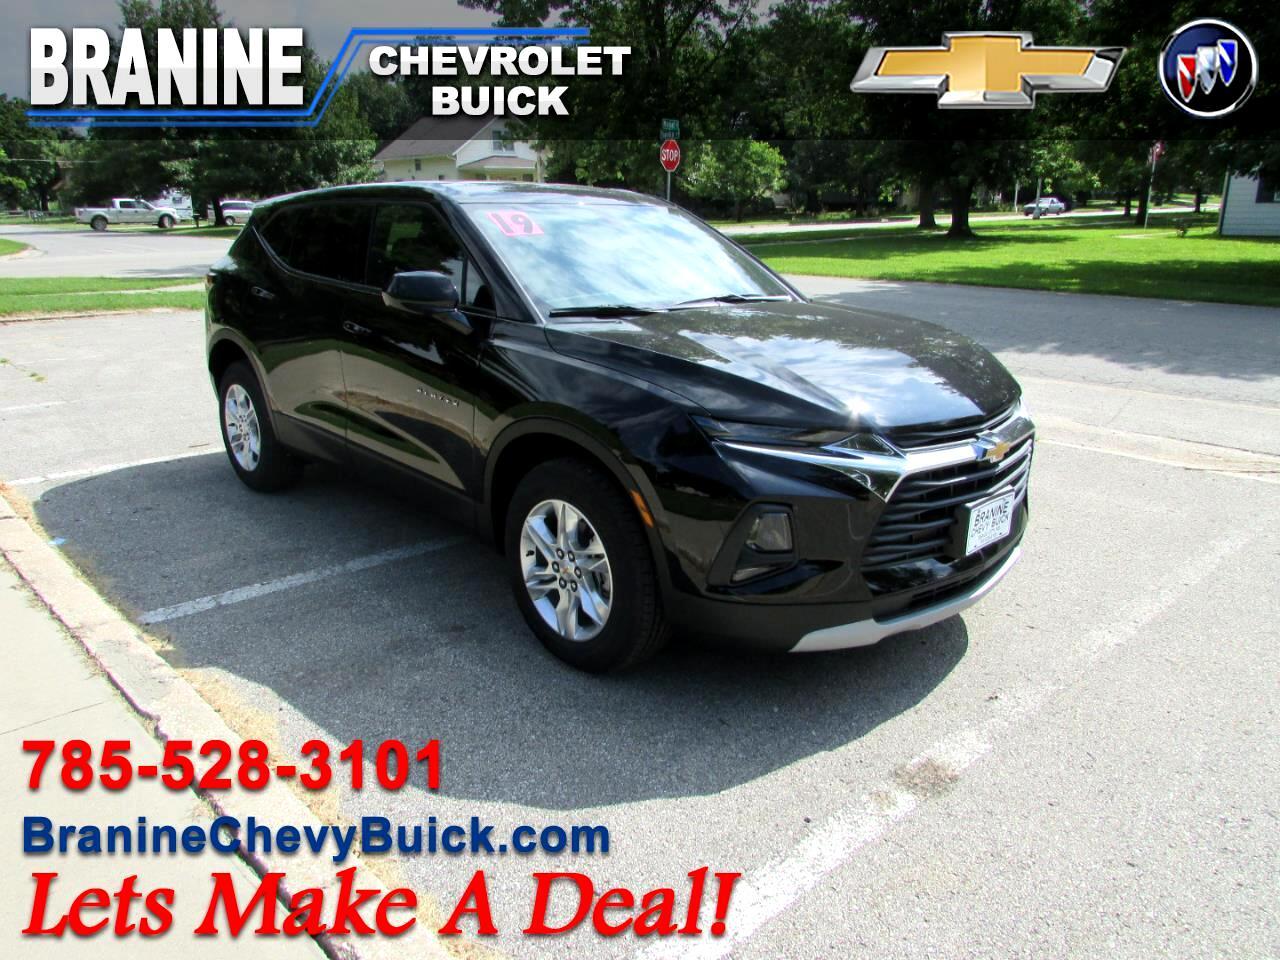 2019 Chevrolet Blazer FWD 4dr w/1LT